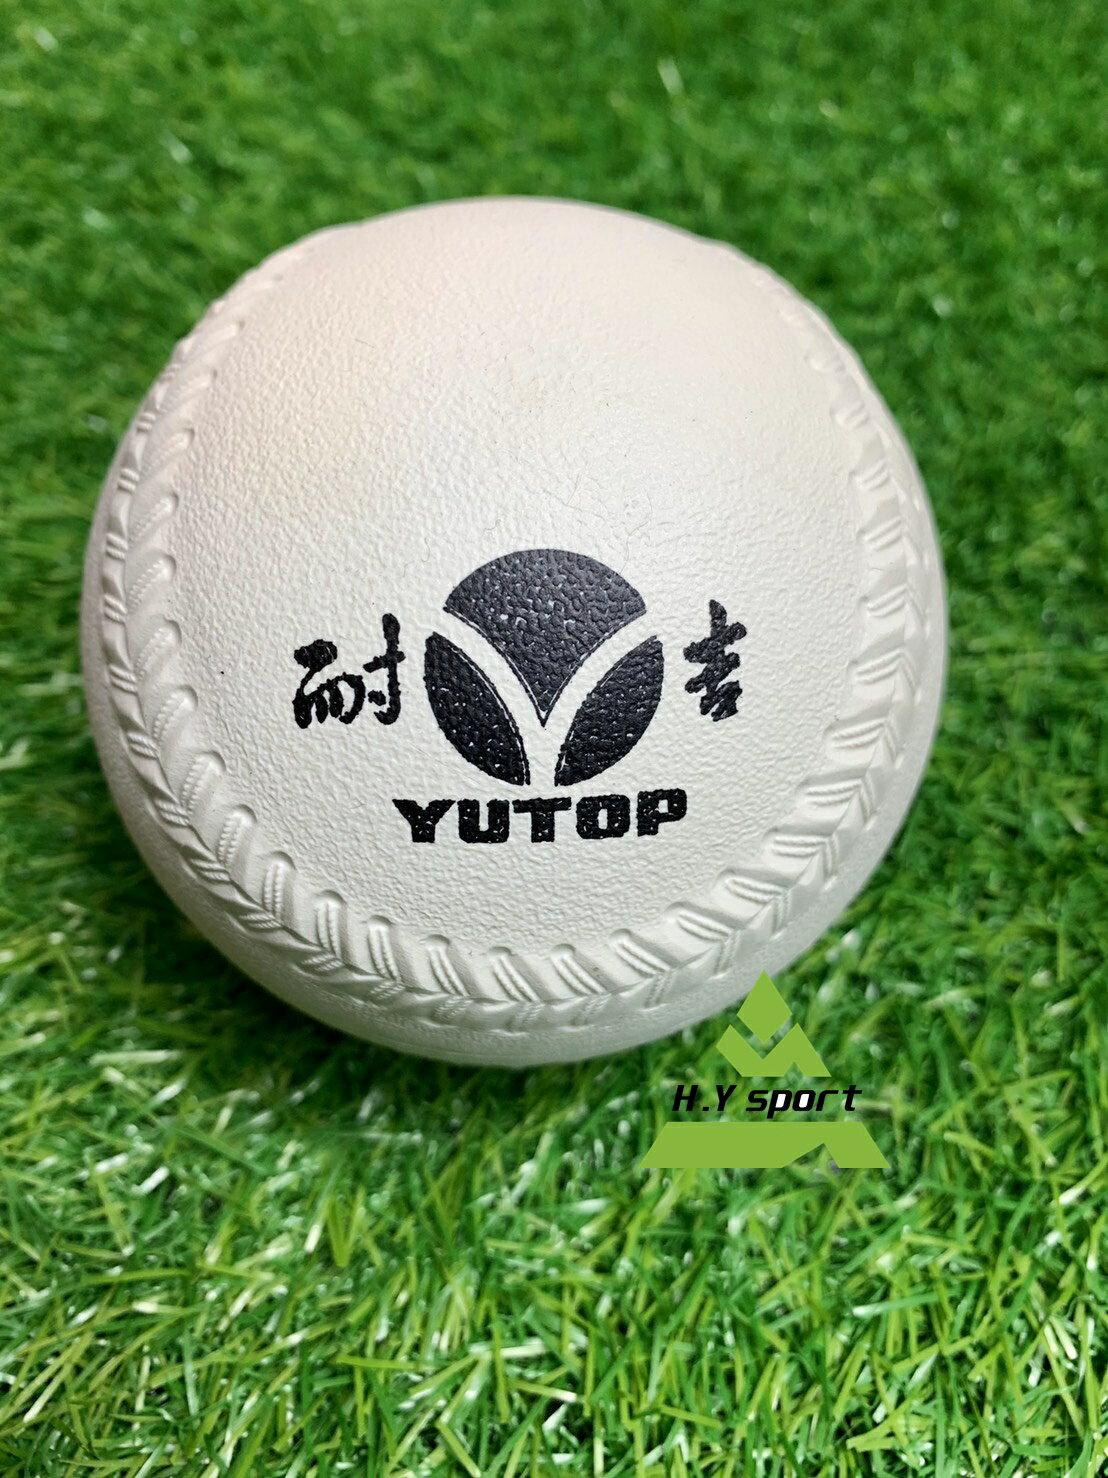 【H.Y SPORT】耐吉 YUTOP 練習壘球 白色 硬式壘球 0